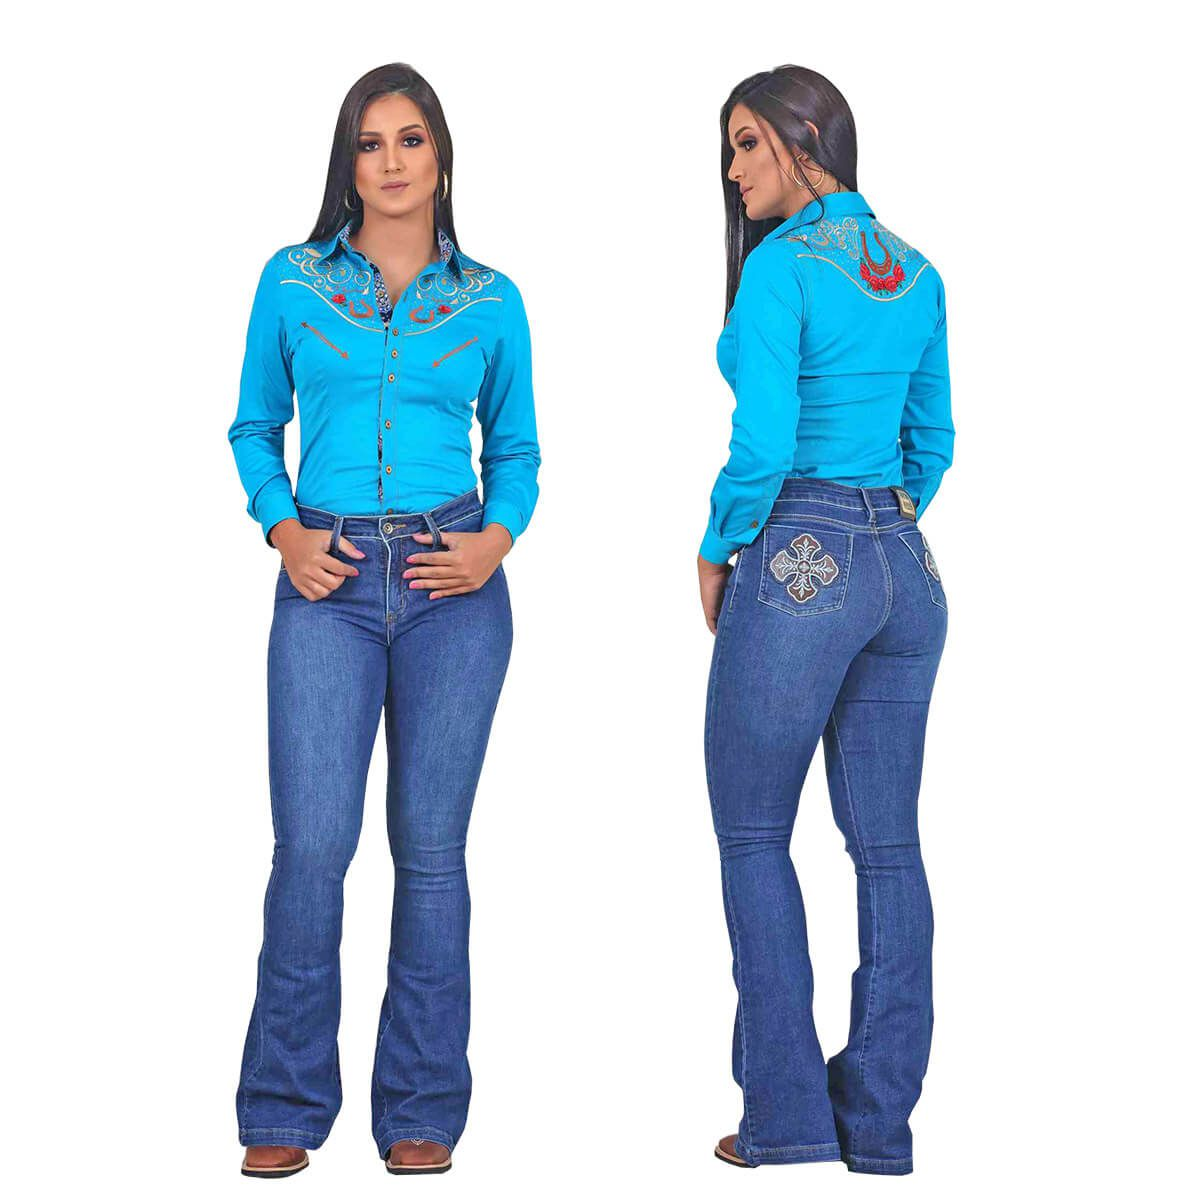 Camisete Os Vaqueiros Azul Turquesa Ferradura